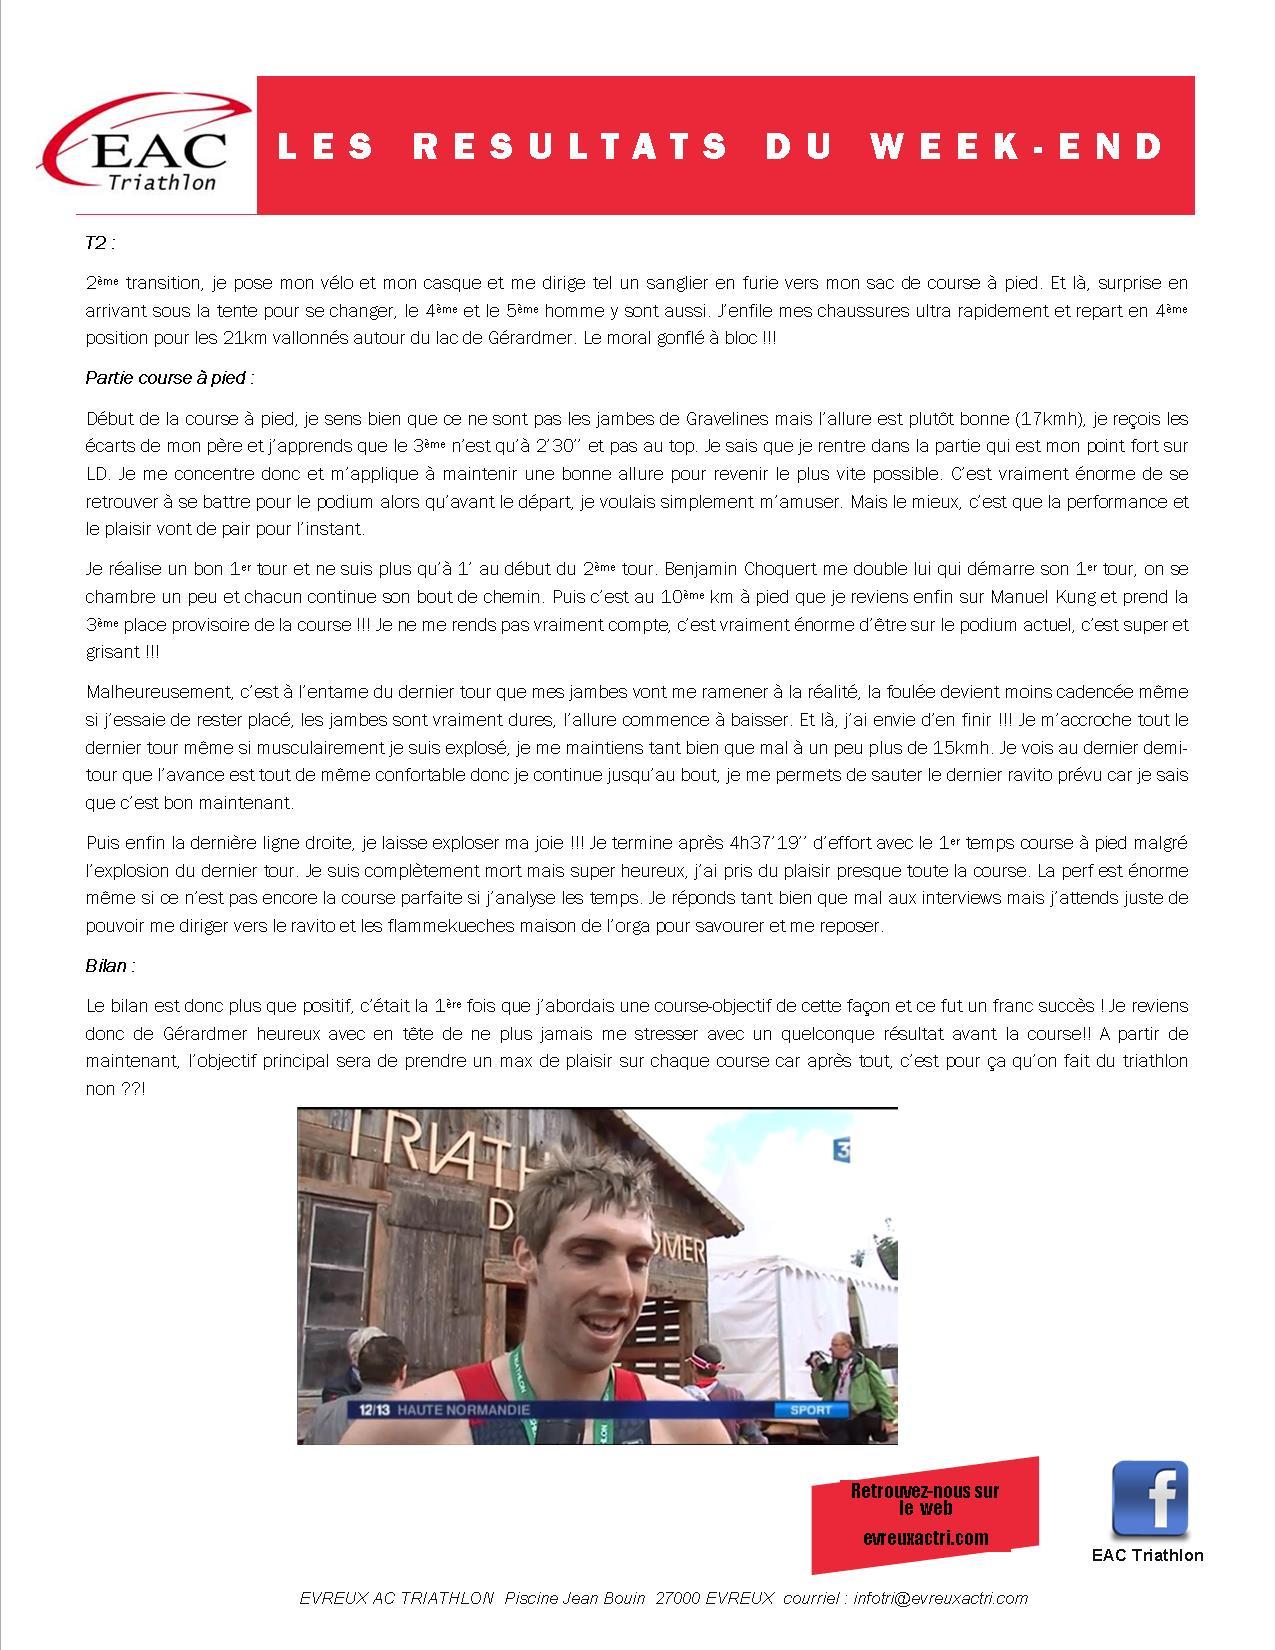 2015 09 05 gerardmer impressions de robin p3